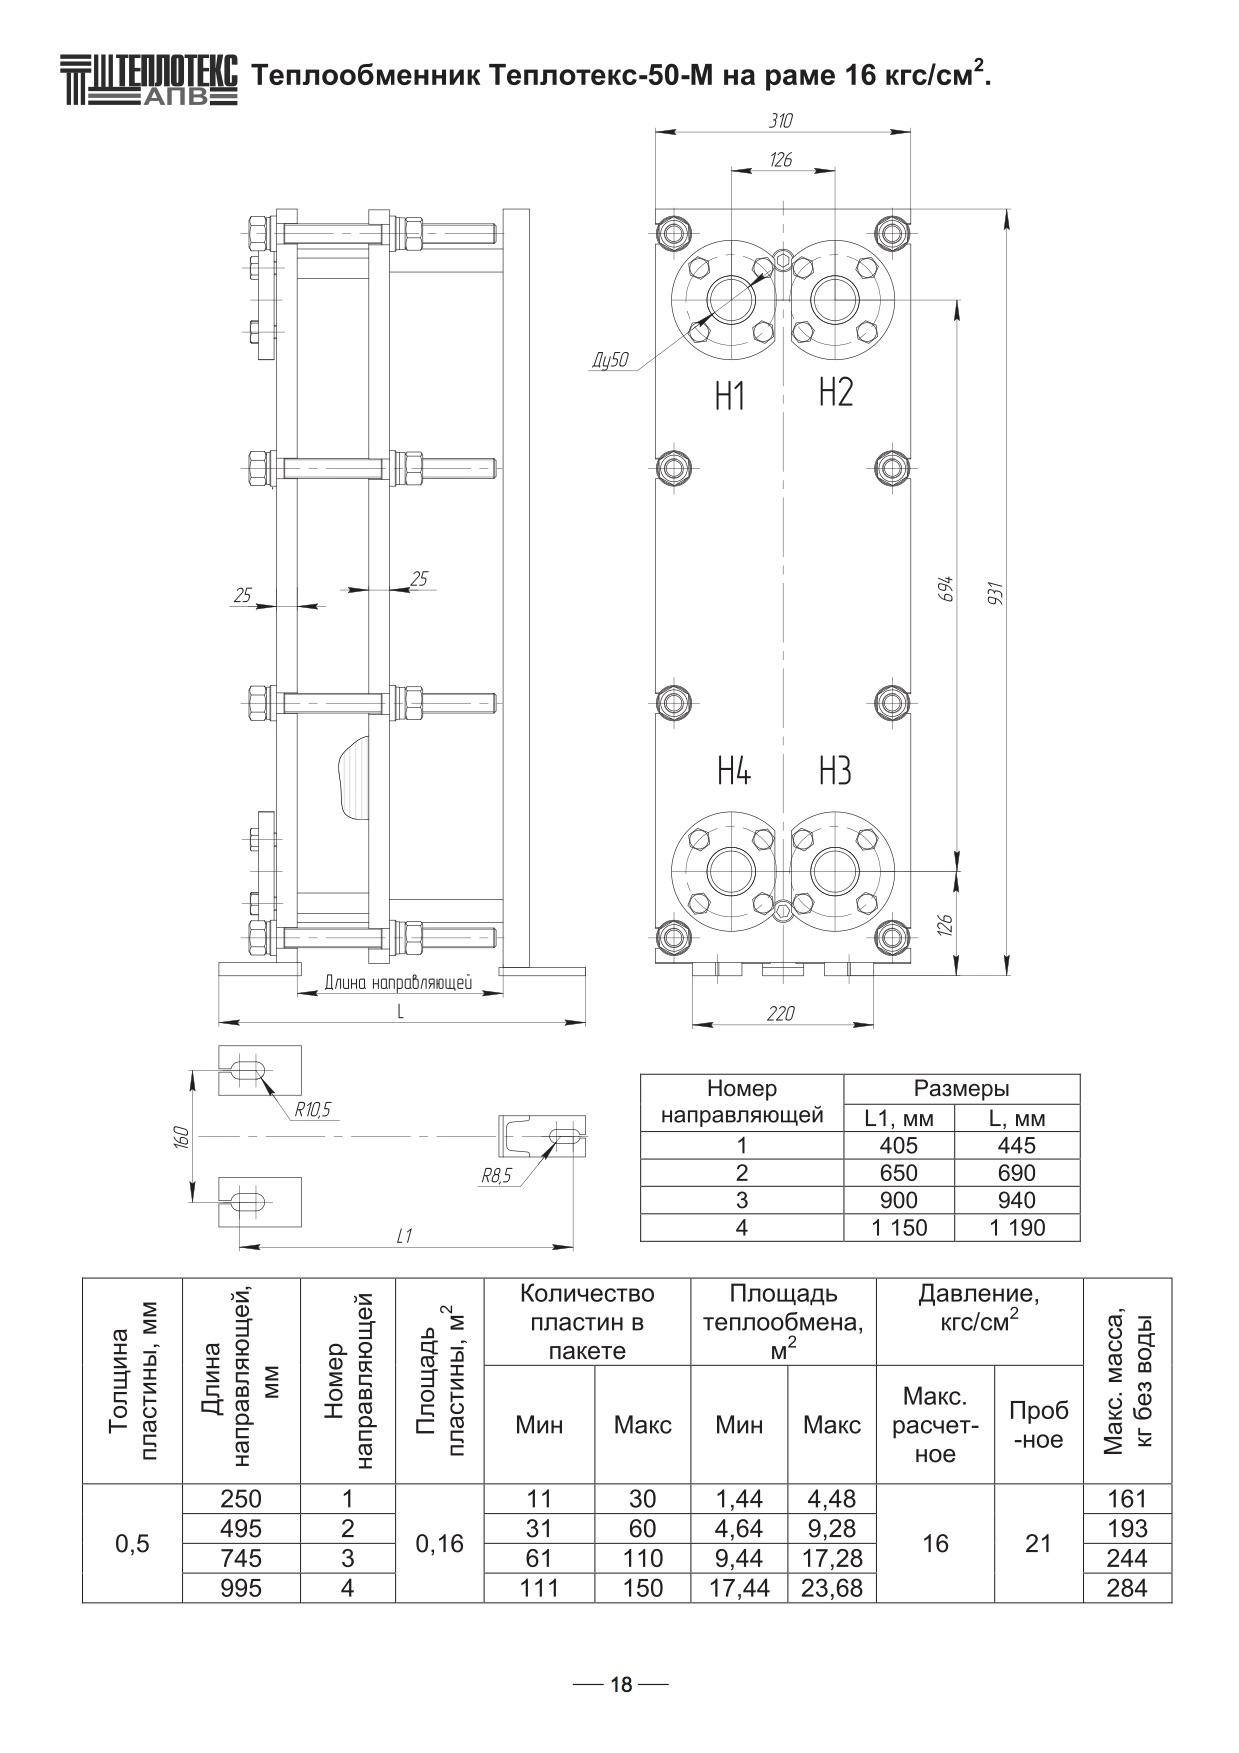 Пластины теплообменника Теплотекс 80B Артём Кожухотрубный испаритель WTK TCE 293 Петрозаводск